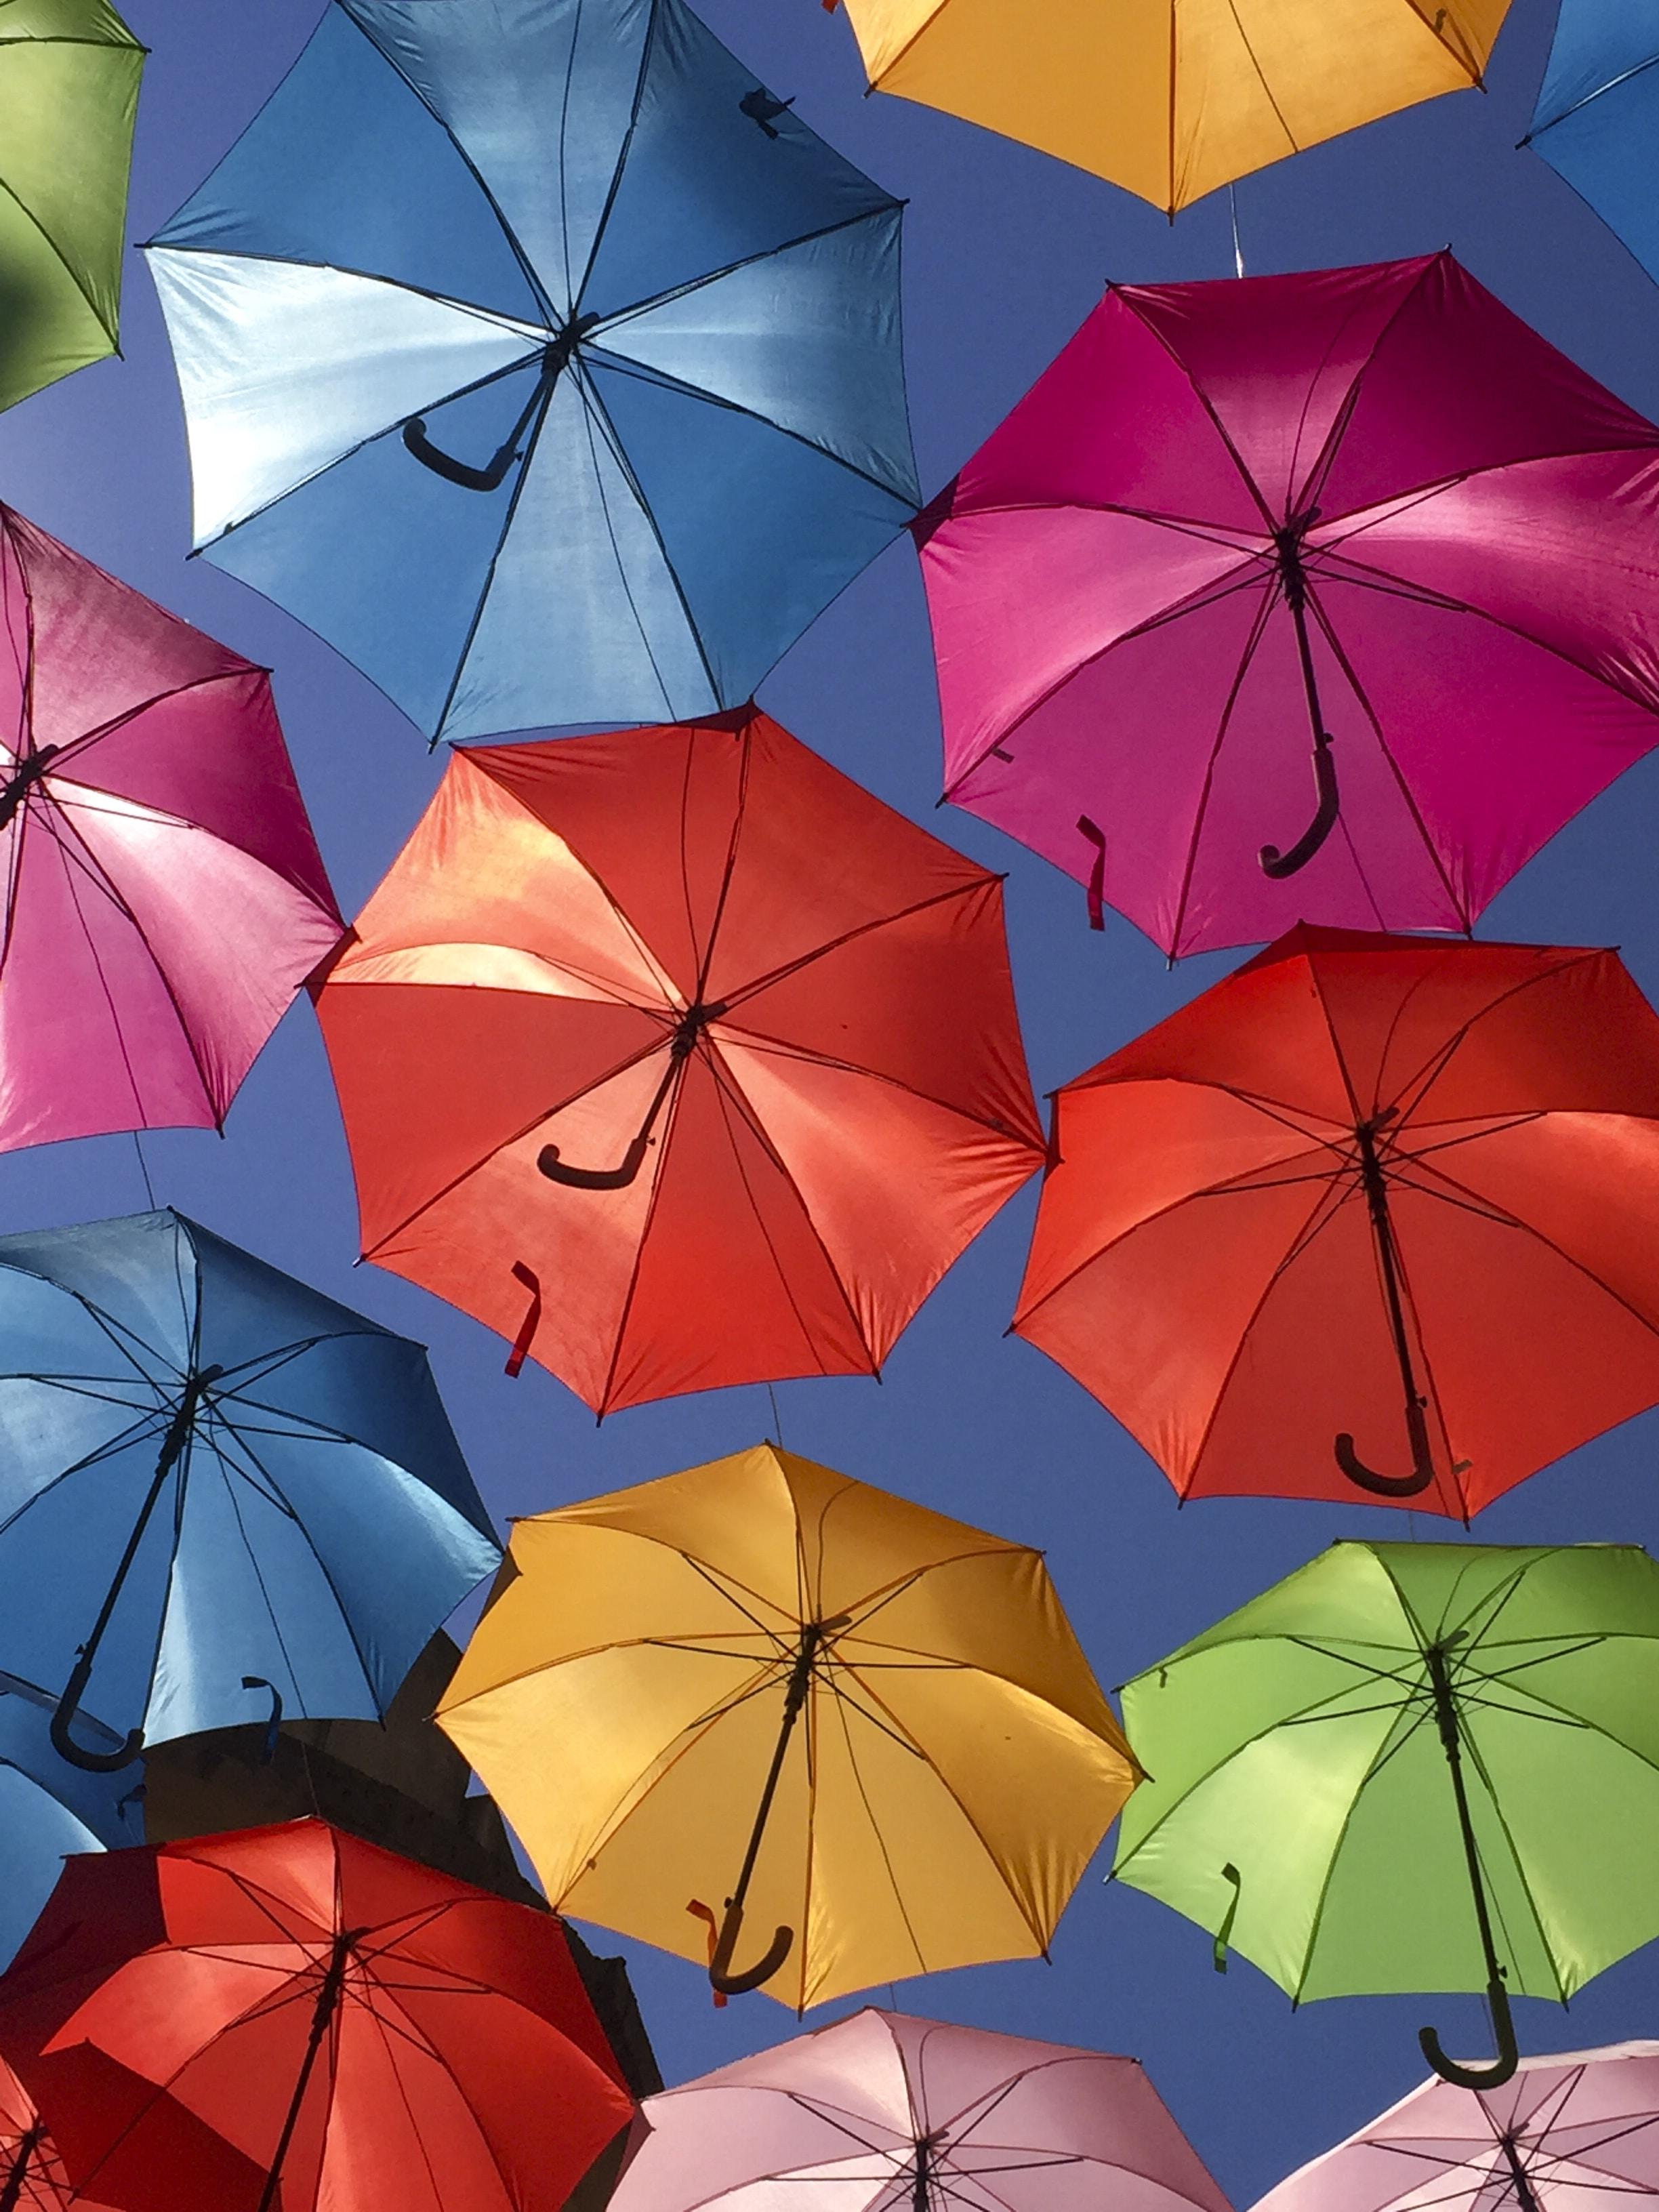 assorted-colored umbrella decor at daytime